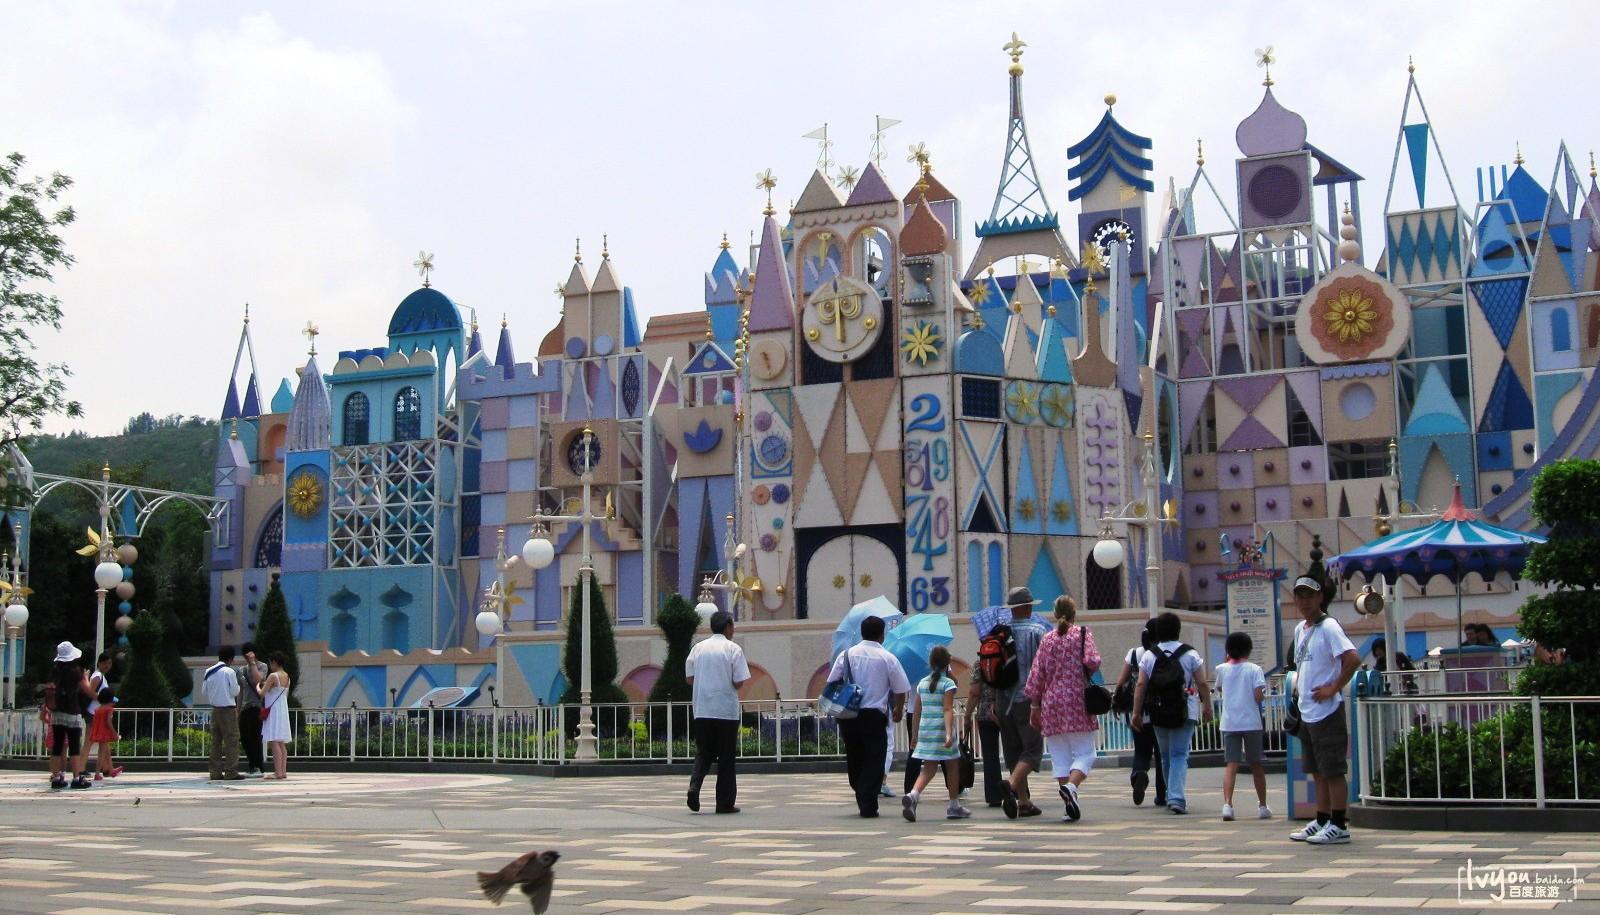 Disneyland Disney Park 2019 I Heart Gaming DuckTales LE Pin